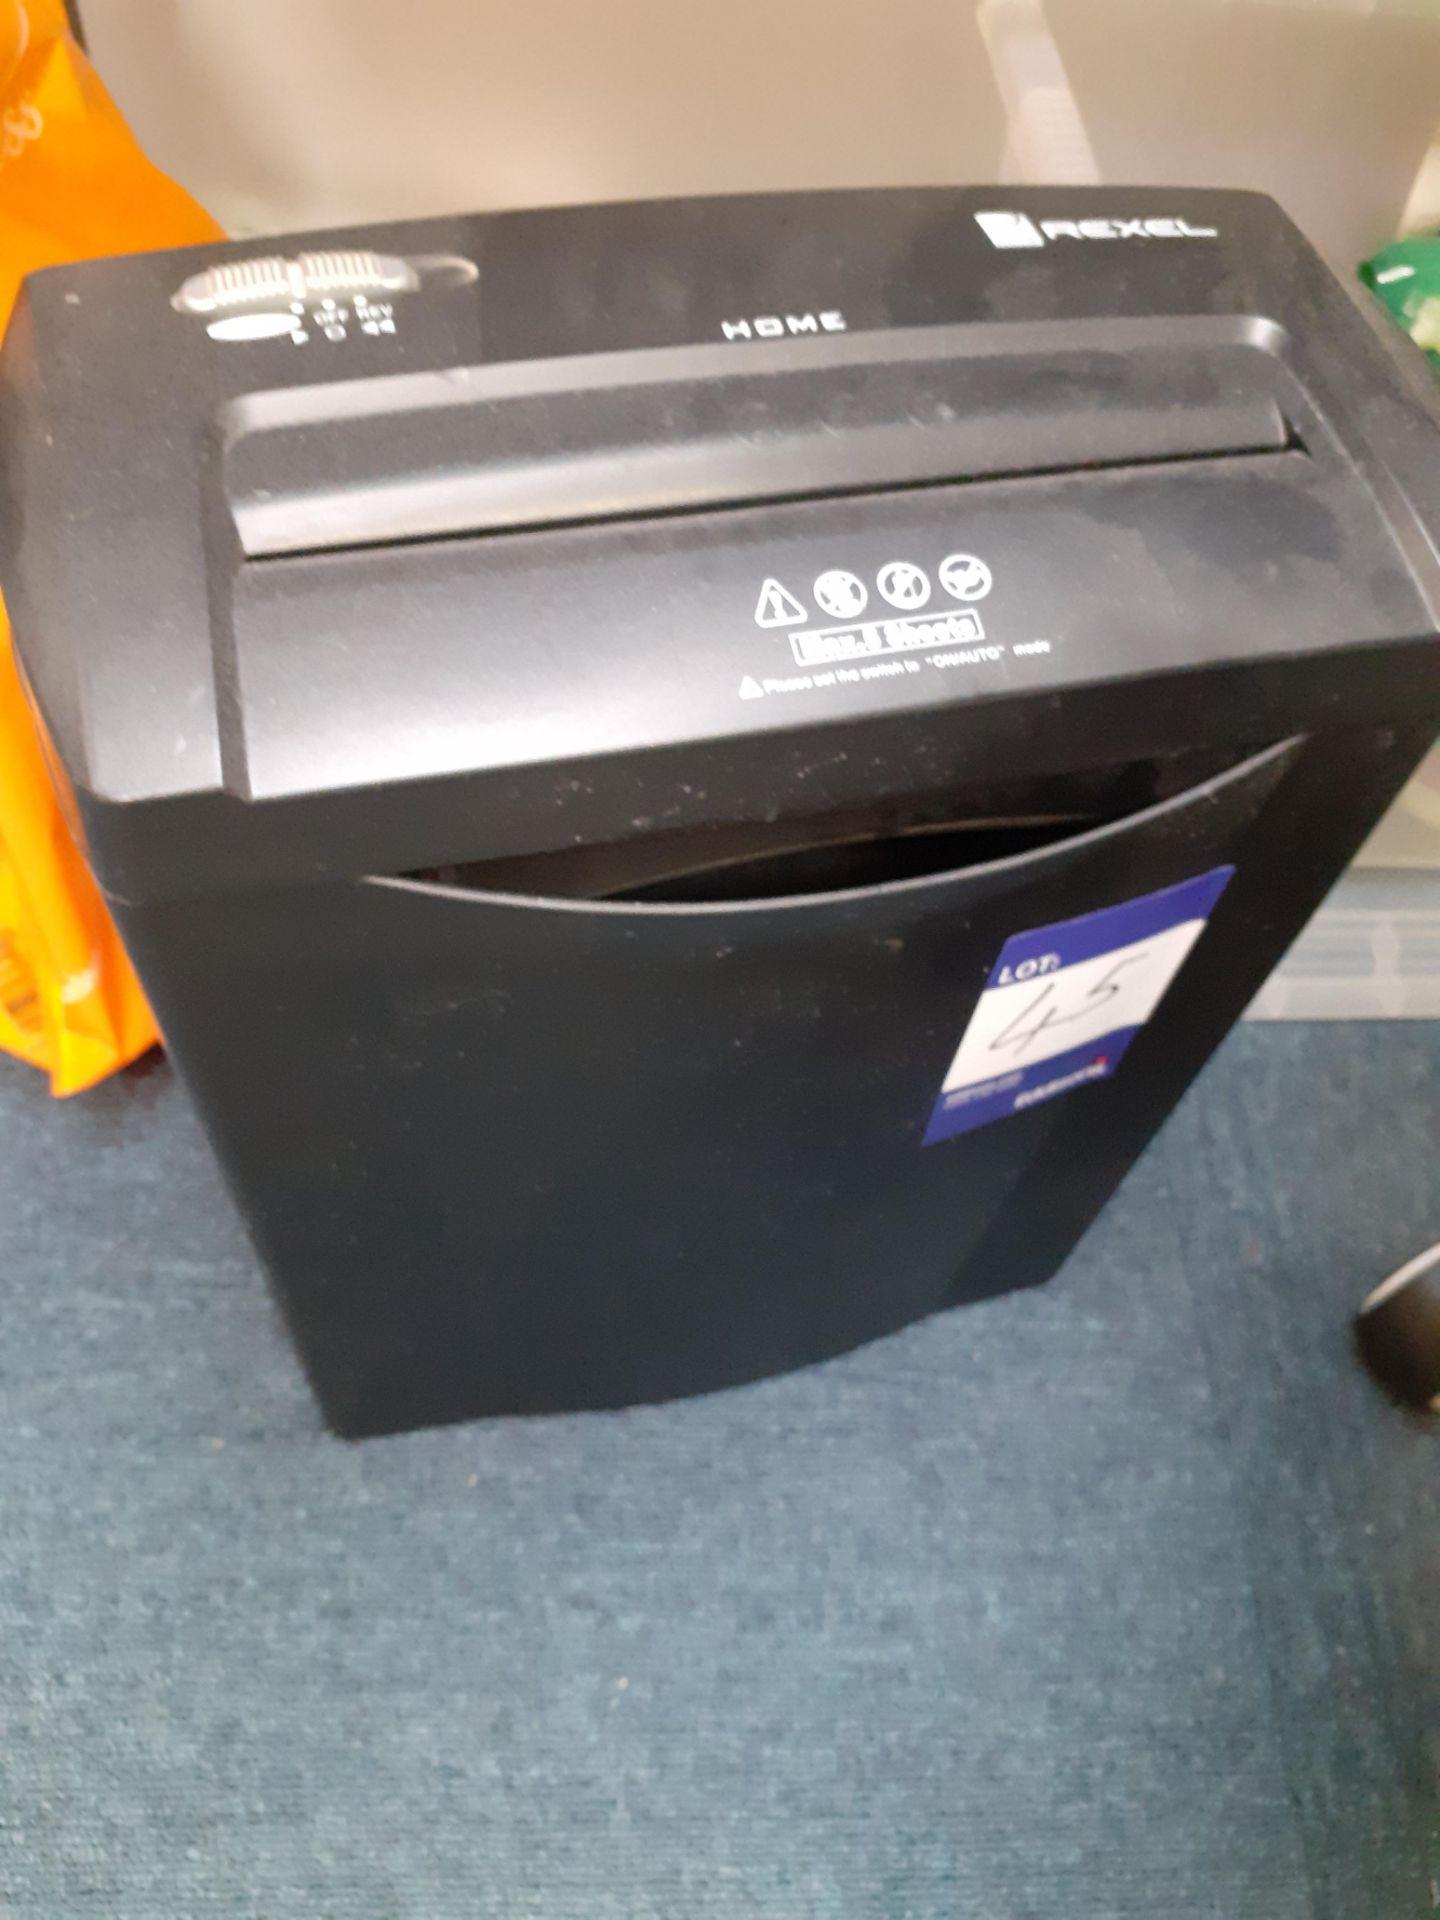 HP Office Jet Pro 6960 Multi Function Printer/Scan - Image 2 of 2